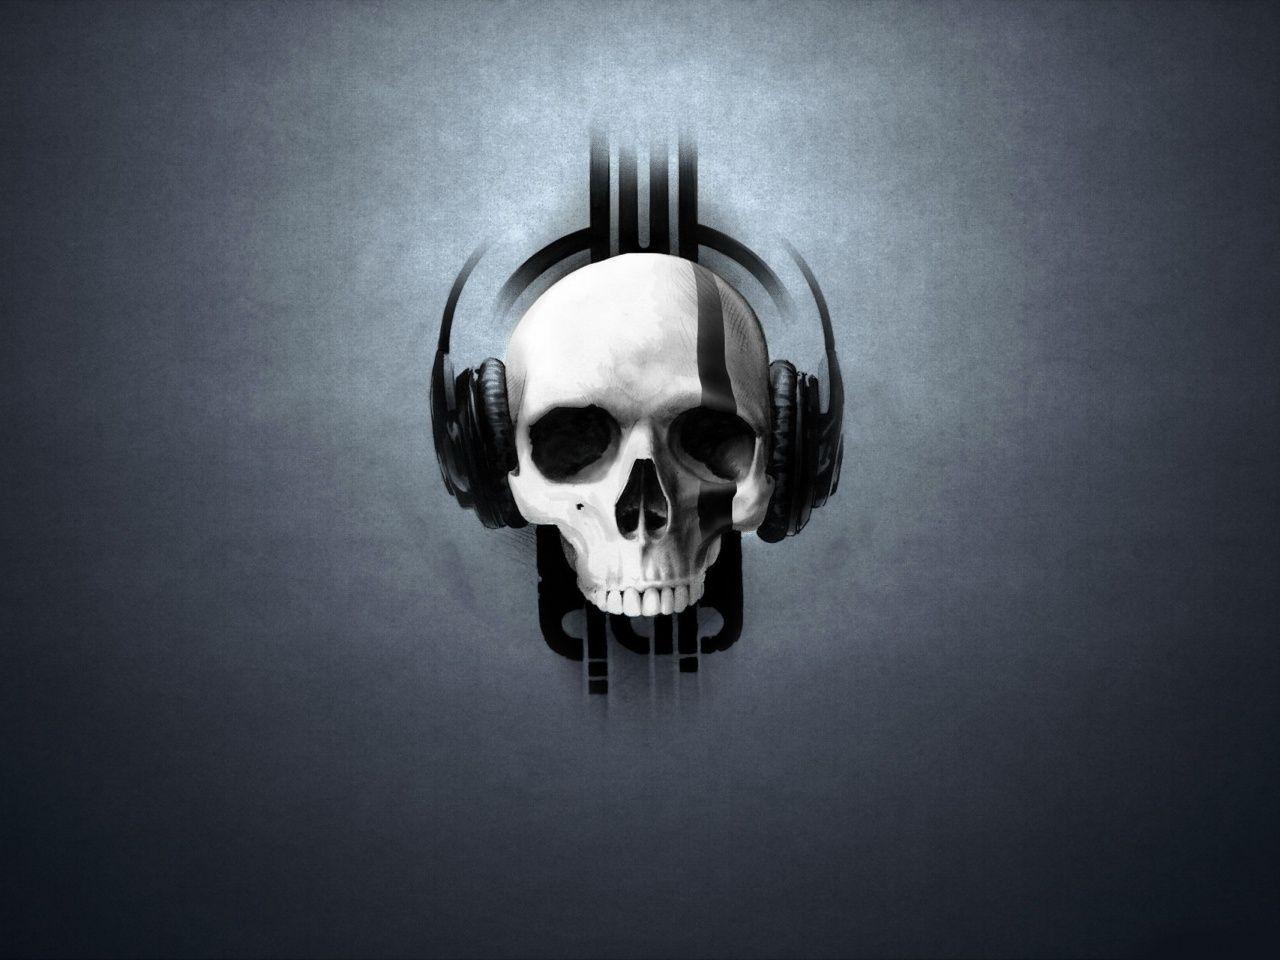 bad94b9290f 47648 skull headphones wallpaper, headphones wallpaper - HD Wallpaper